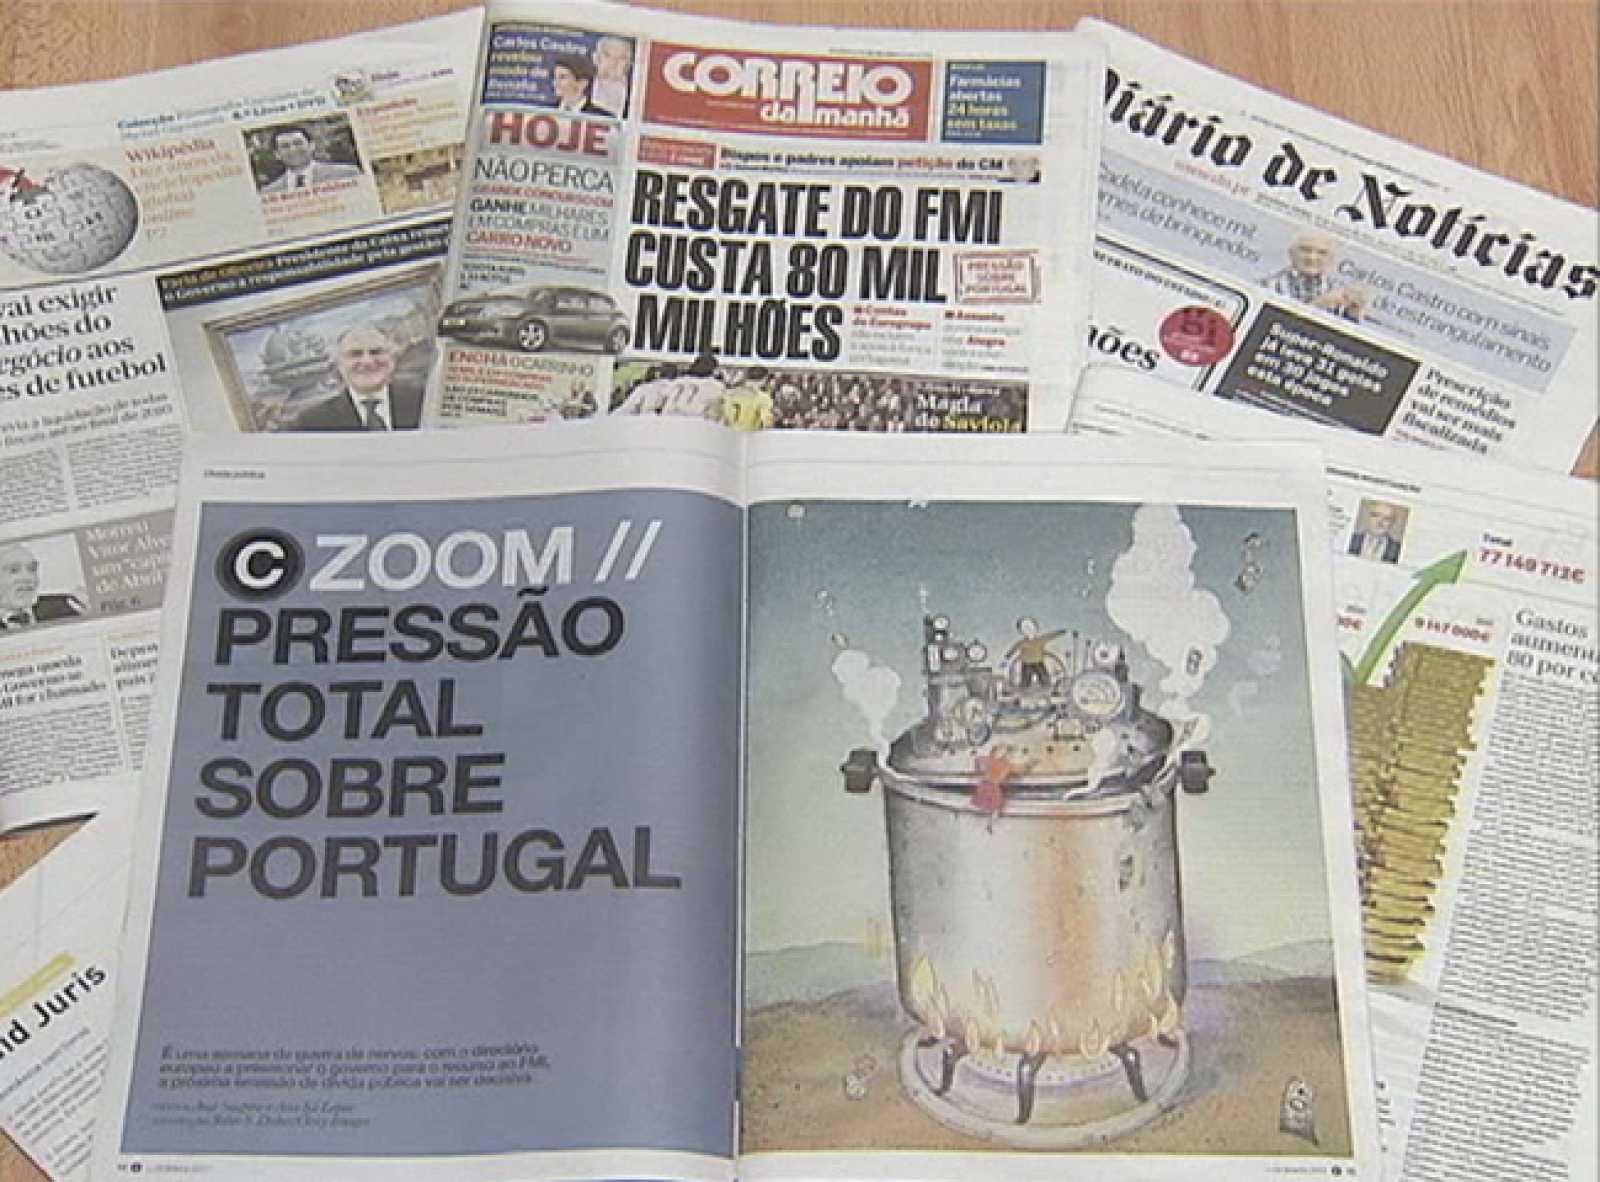 Los inversores siguen sin fiarse de Portugal